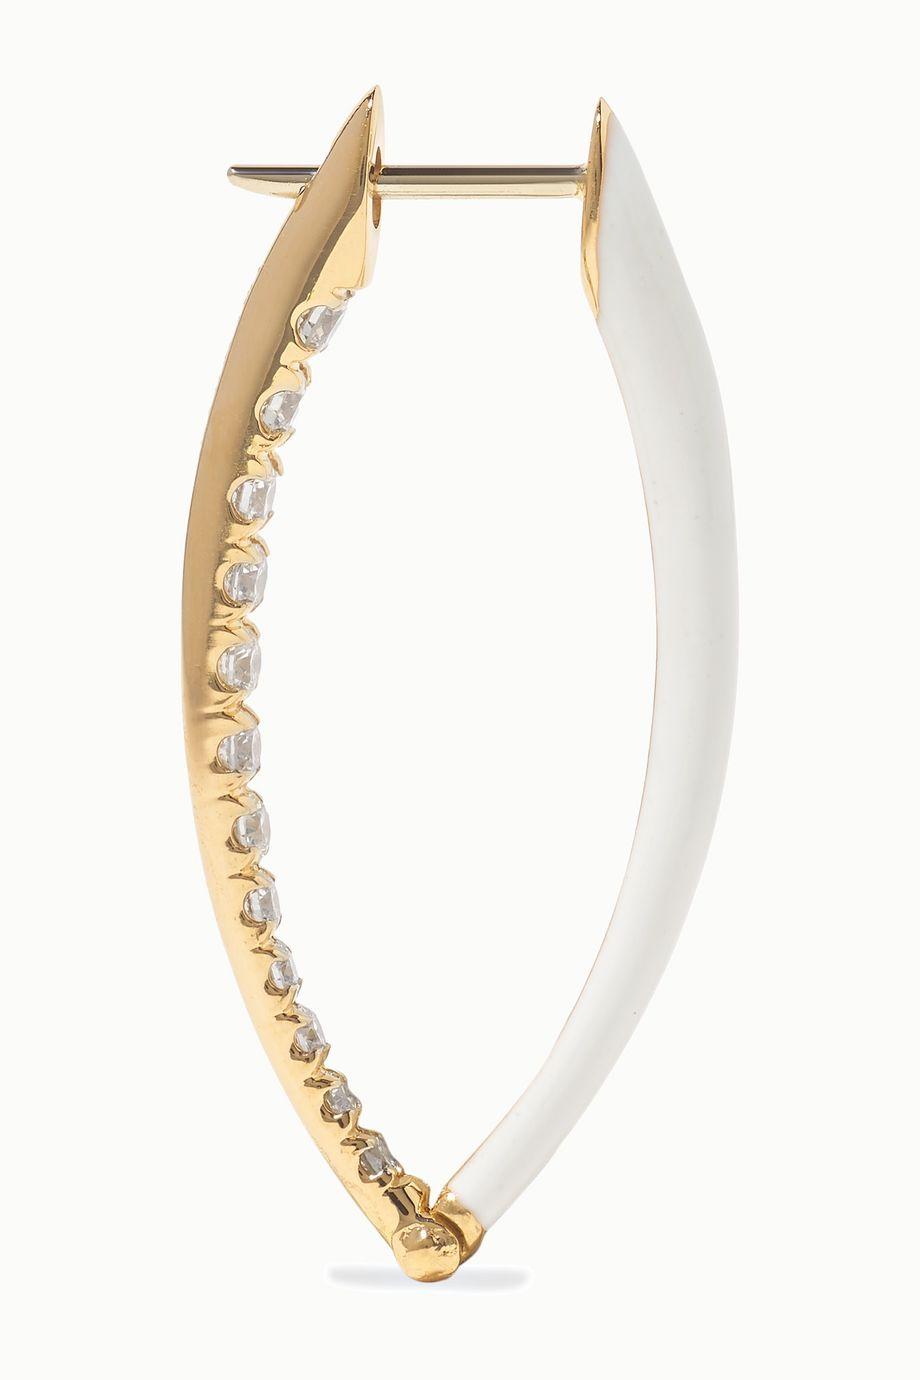 Melissa Kaye Boucles d'oreilles en or 18 carats, émail et diamants Cristina medium